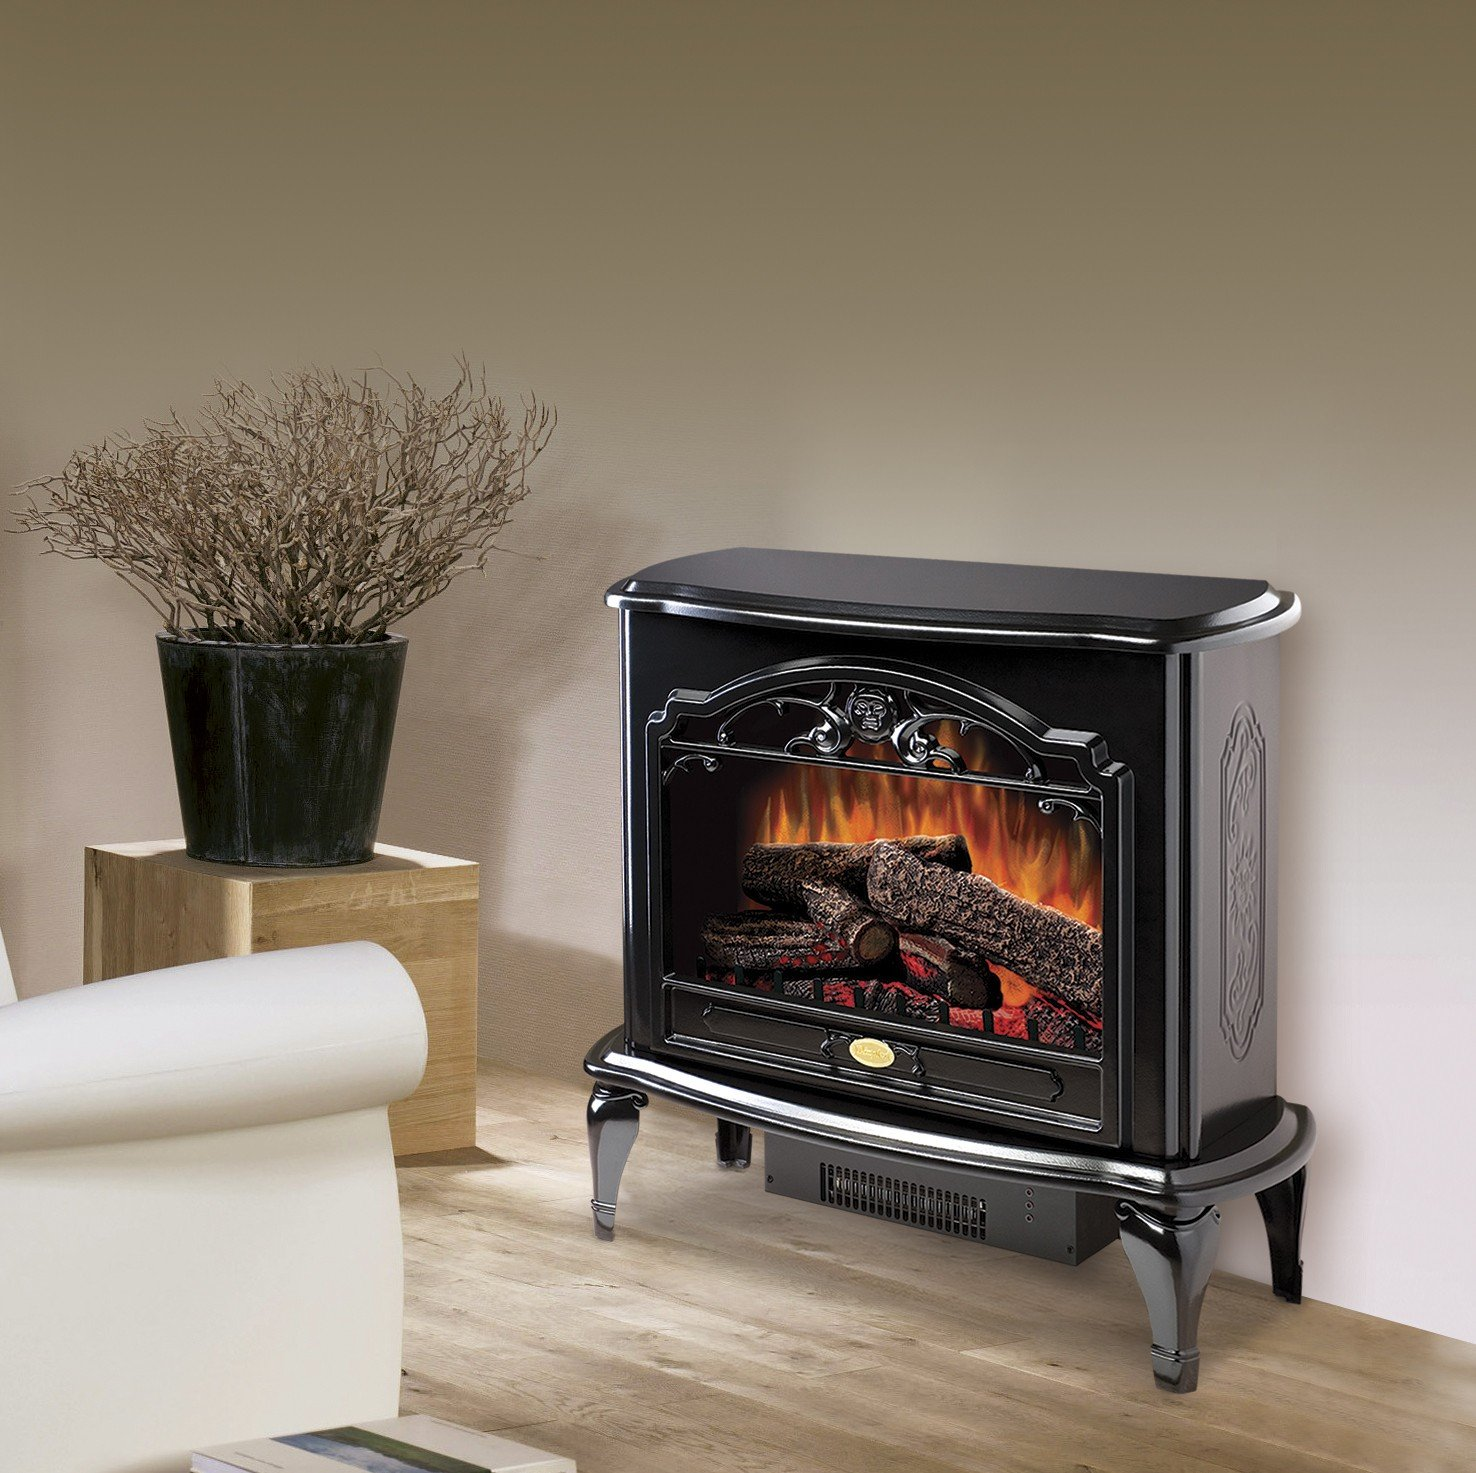 amazon com dimplex tds8515tb celeste electric stove glossy black